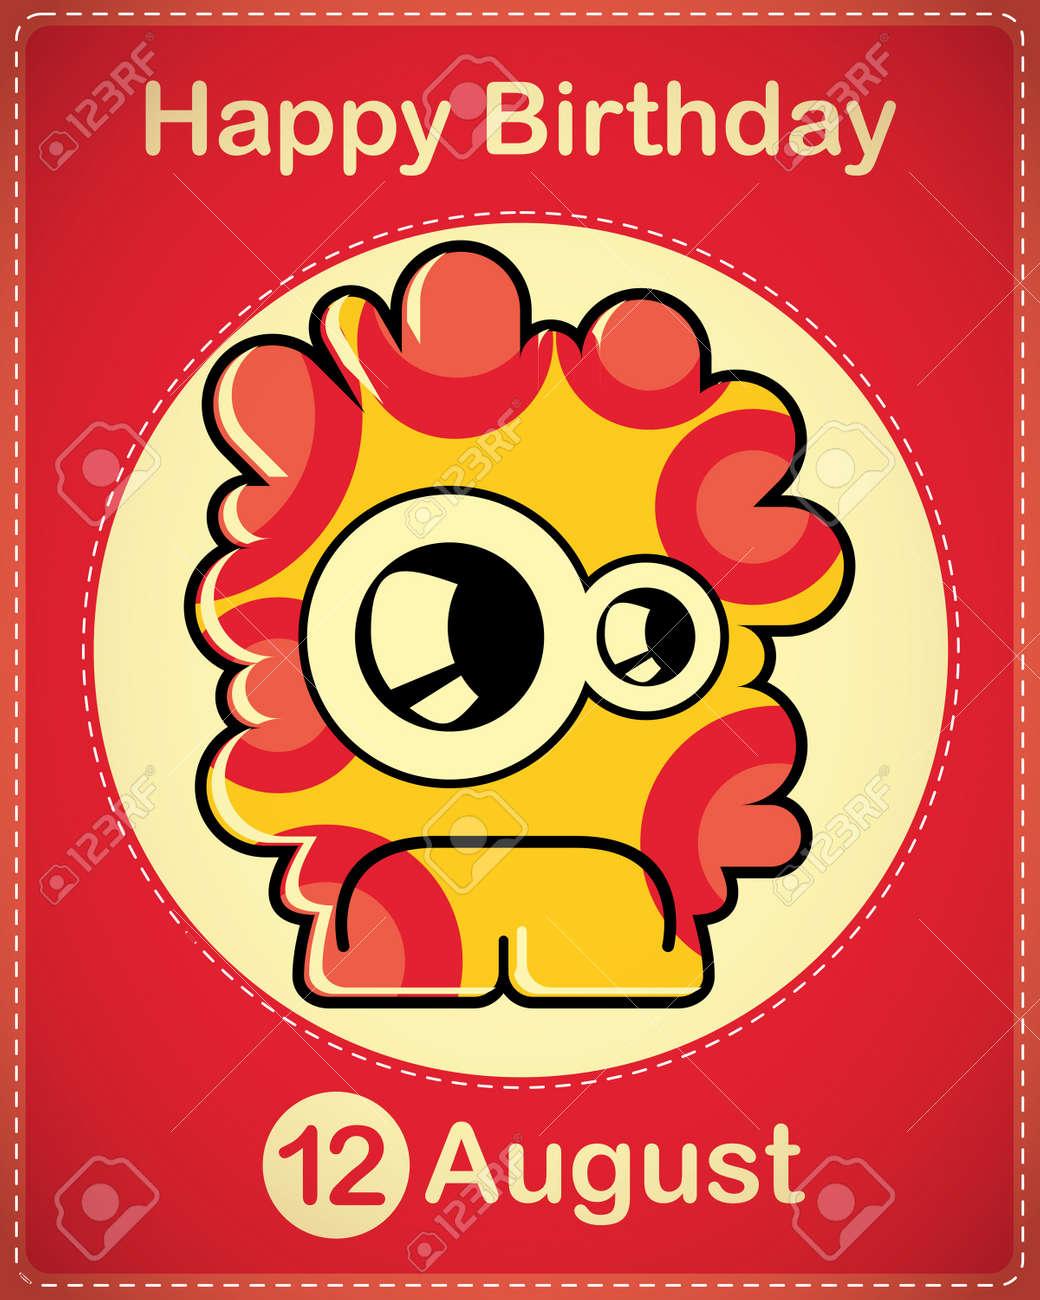 Happy birthday card with cute cartoon monster Stock Vector - 17978401